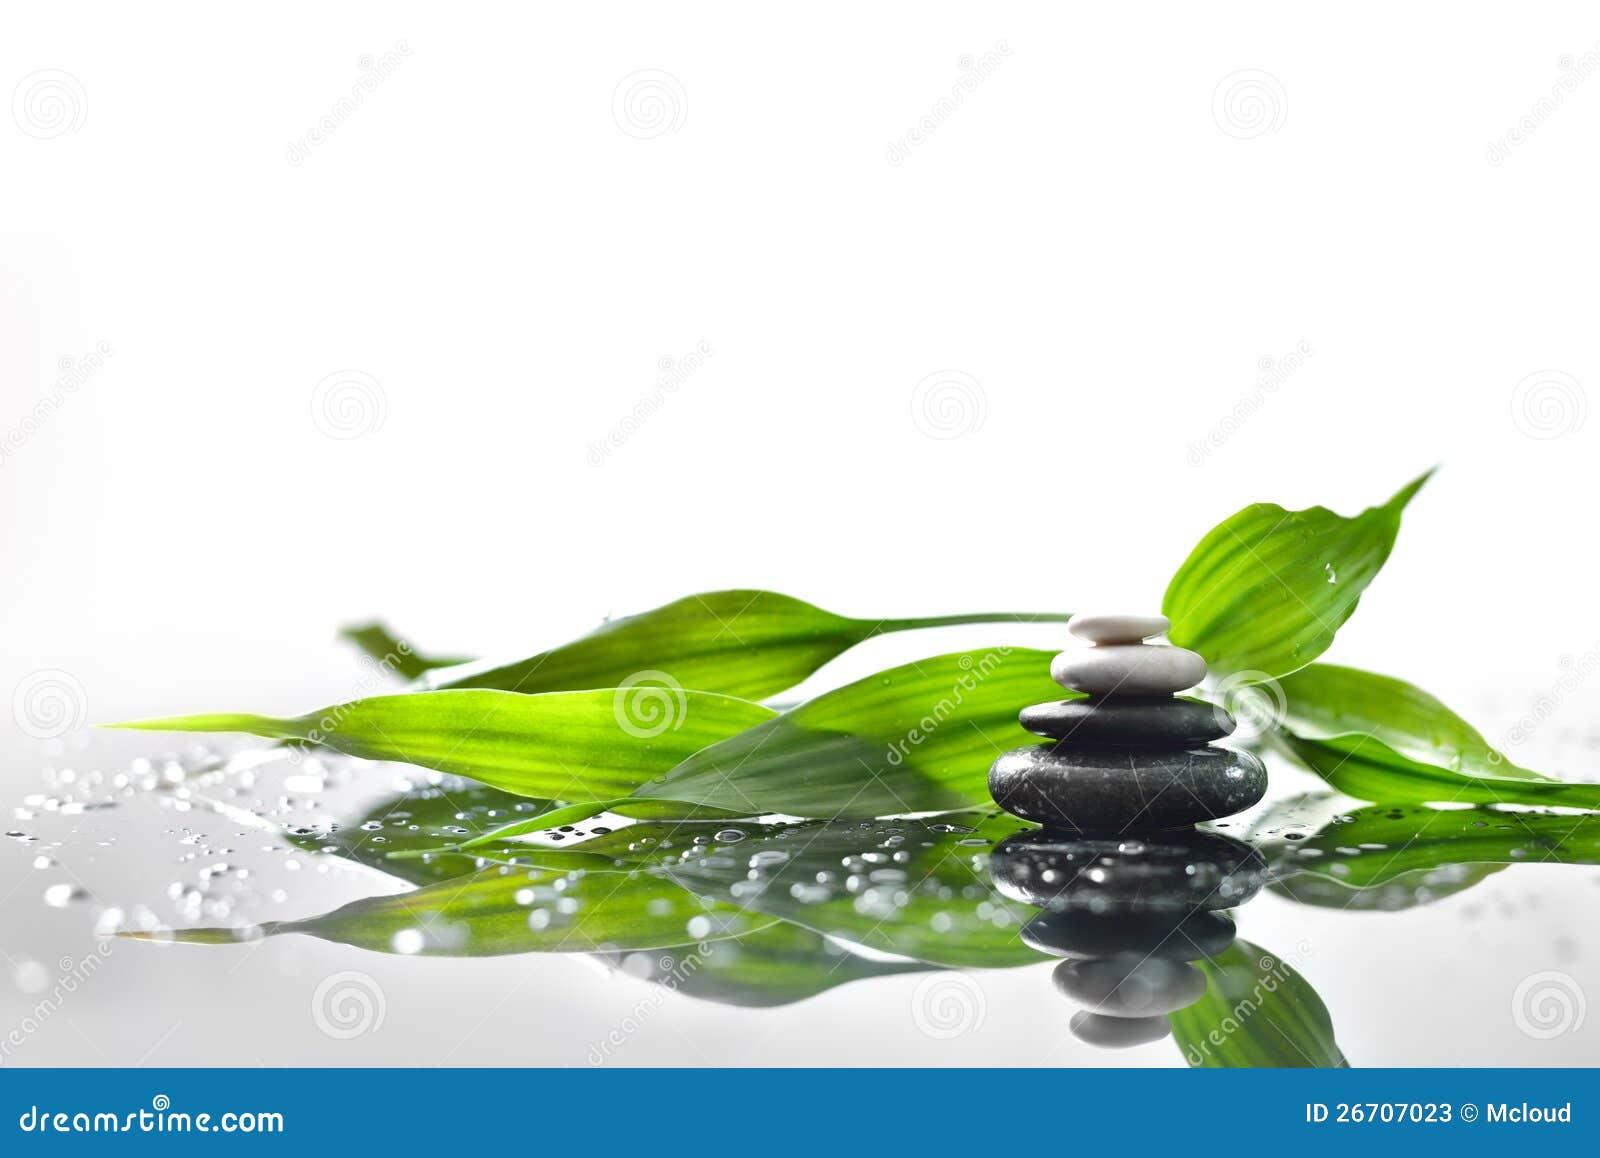 zen stones and green bamboo stock photos   image 26707023